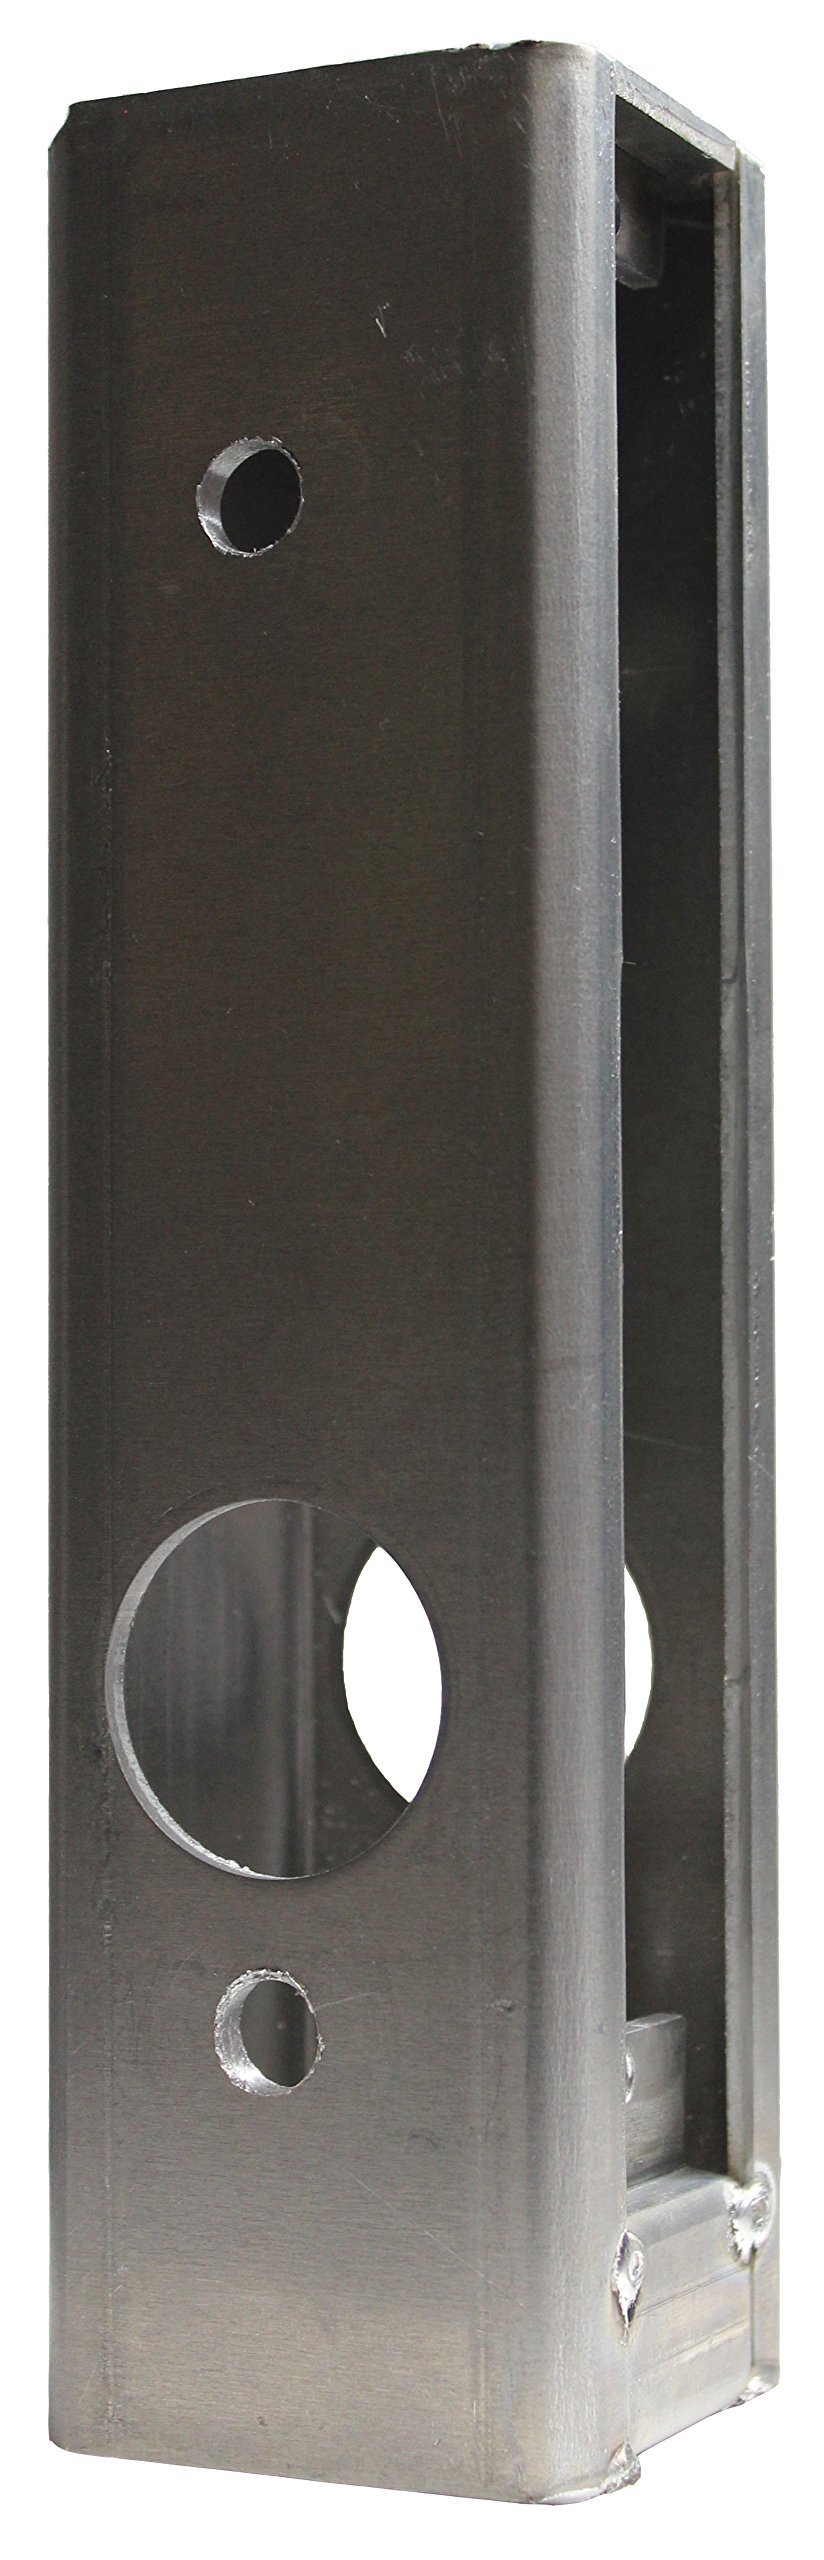 GB900AL Gate Box